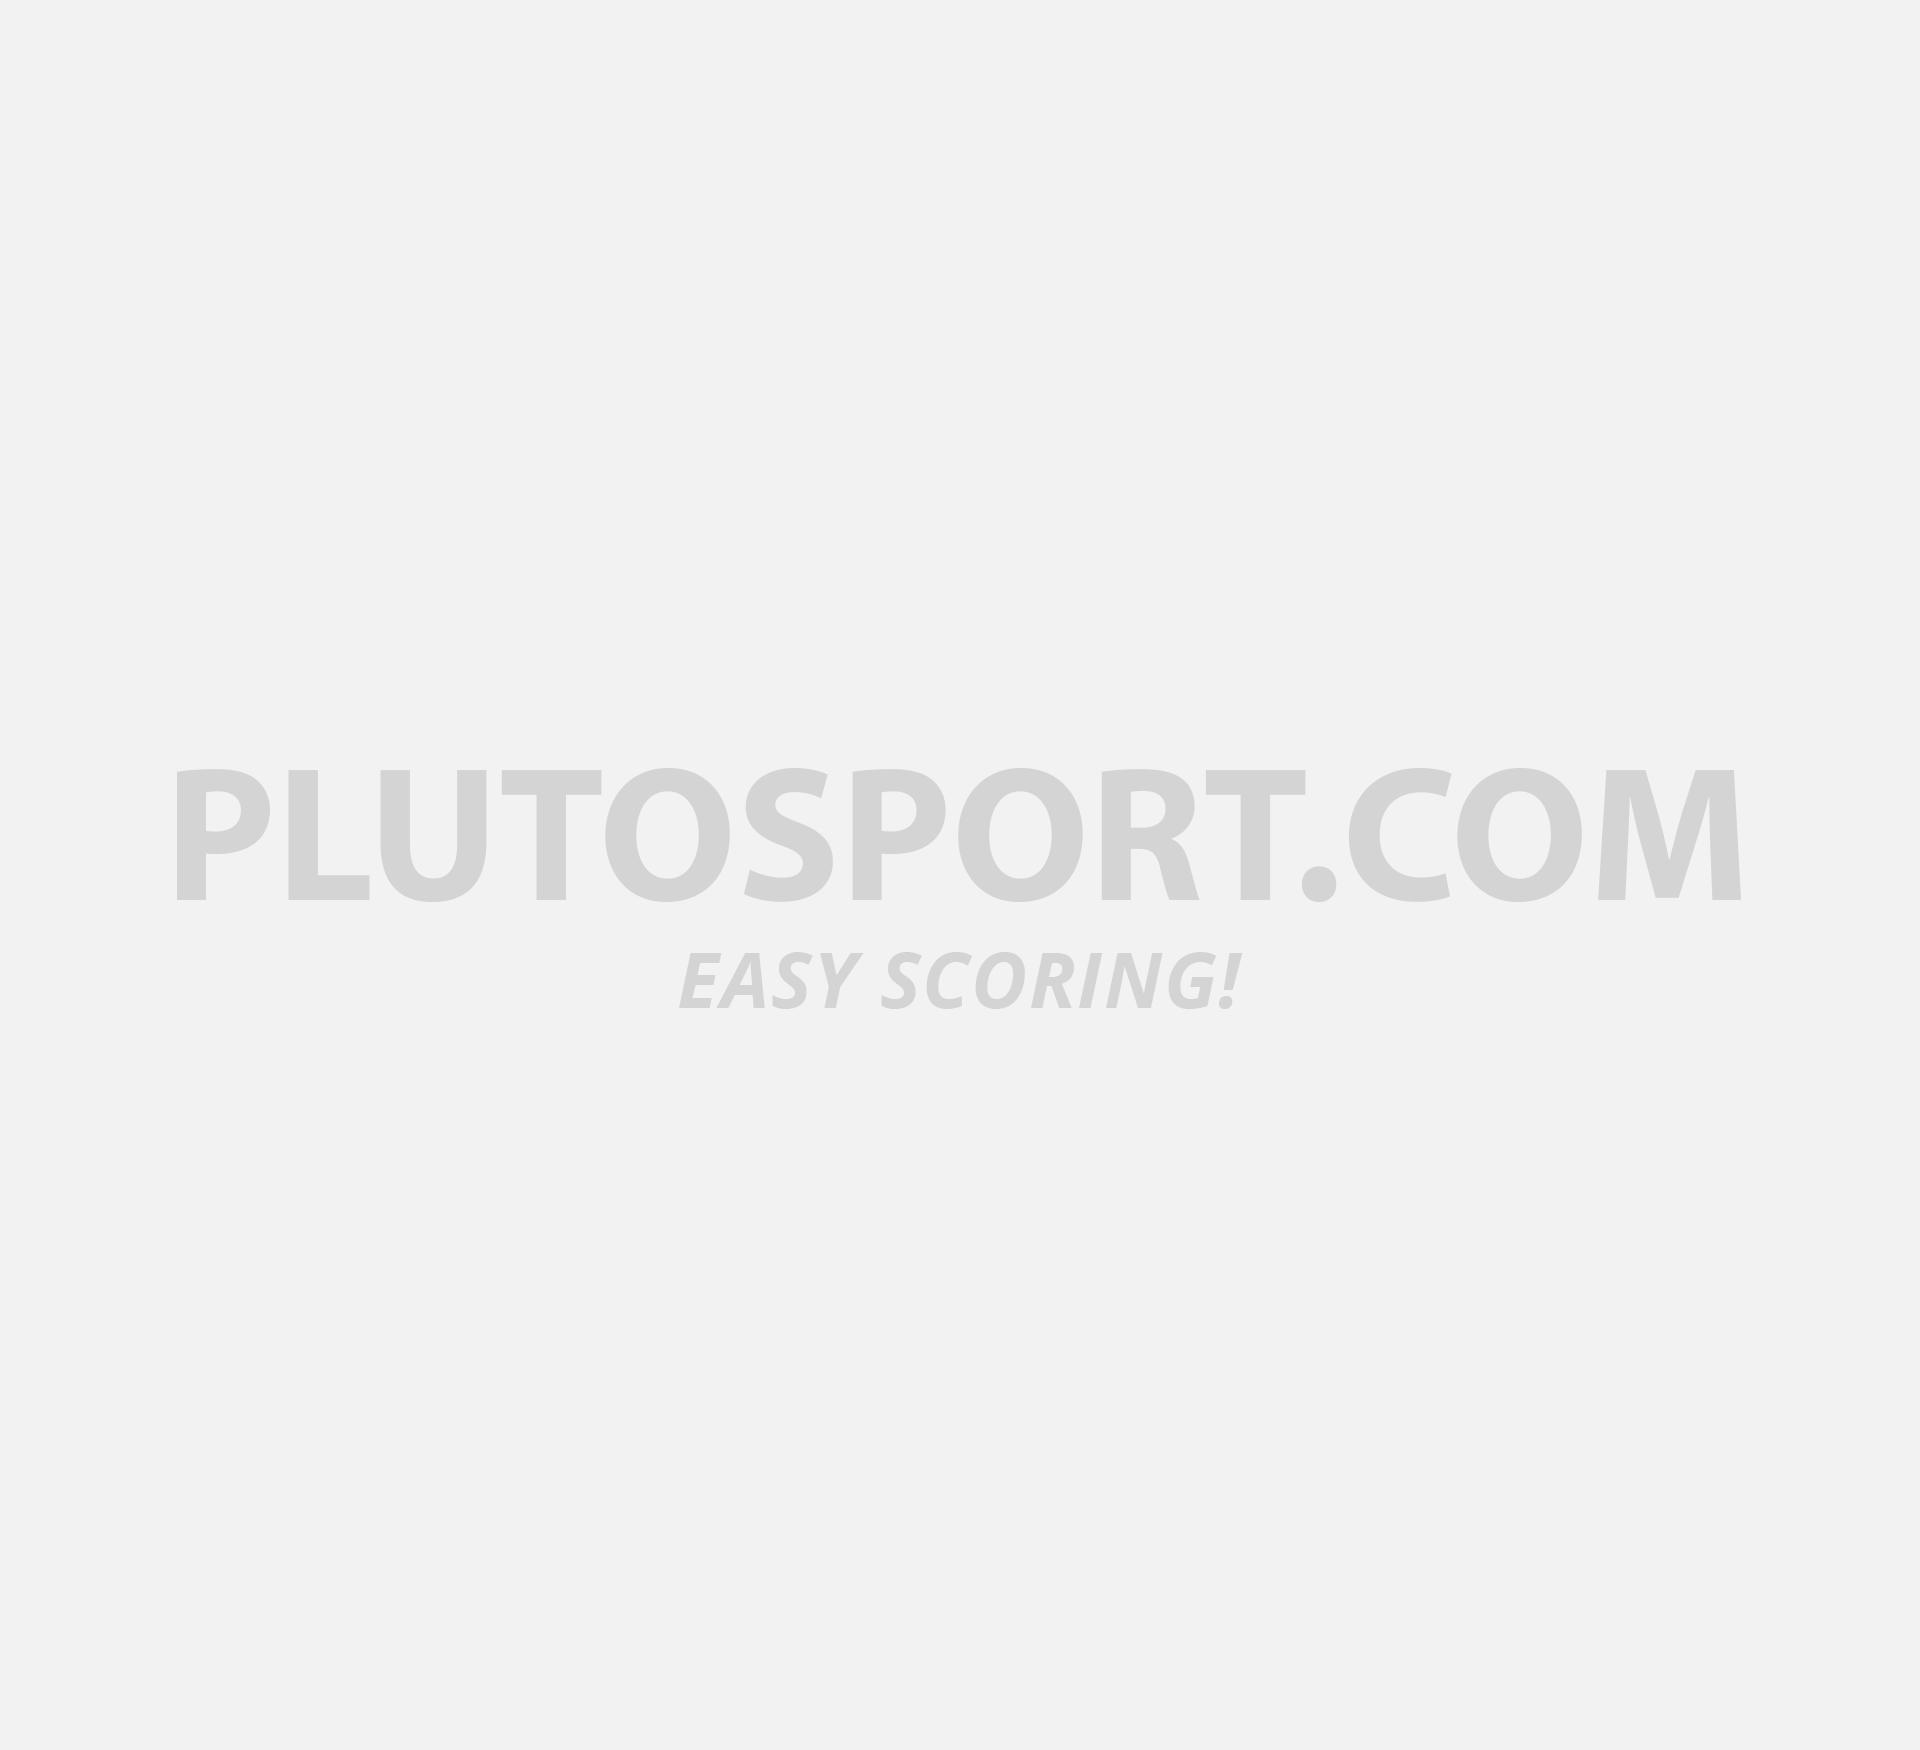 reputable site ed33f 3b770 Nike Benassi JDI - Bath slippers - Slippers - Shoes - Lifestyle - Sports   Plutosport